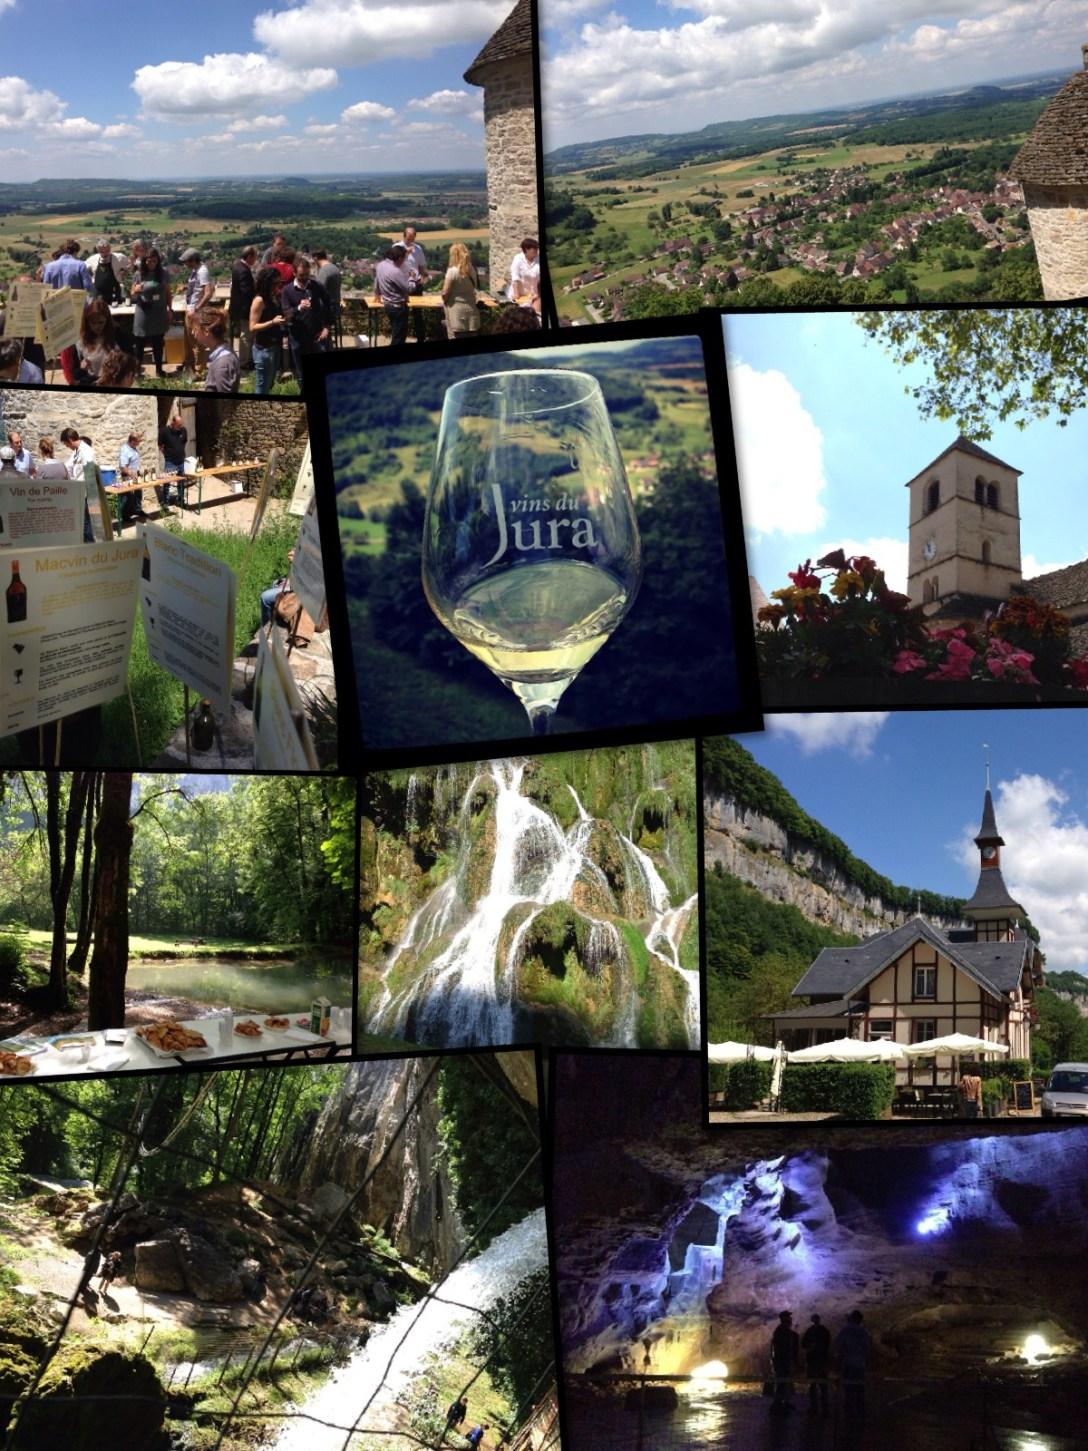 Oenotourisme-Vinocamp Jura 2013